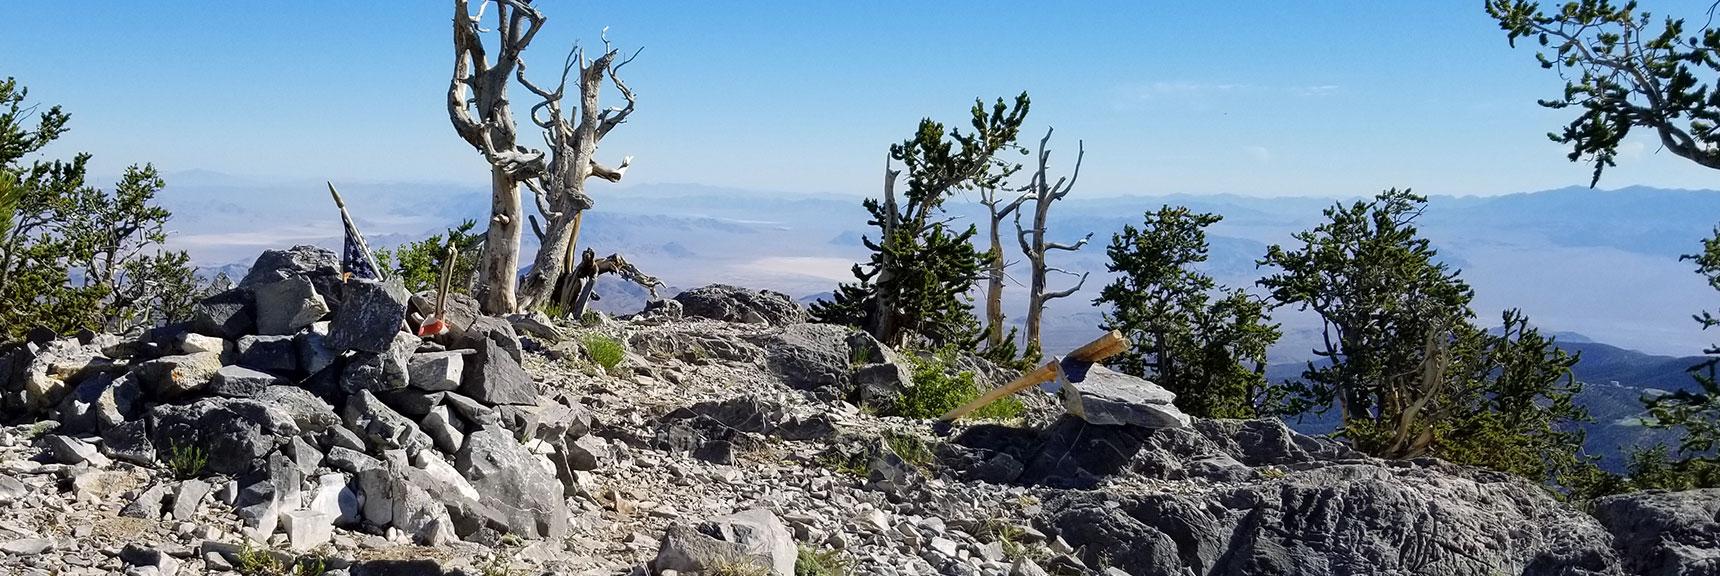 Fletcher Peak Summit Looking North